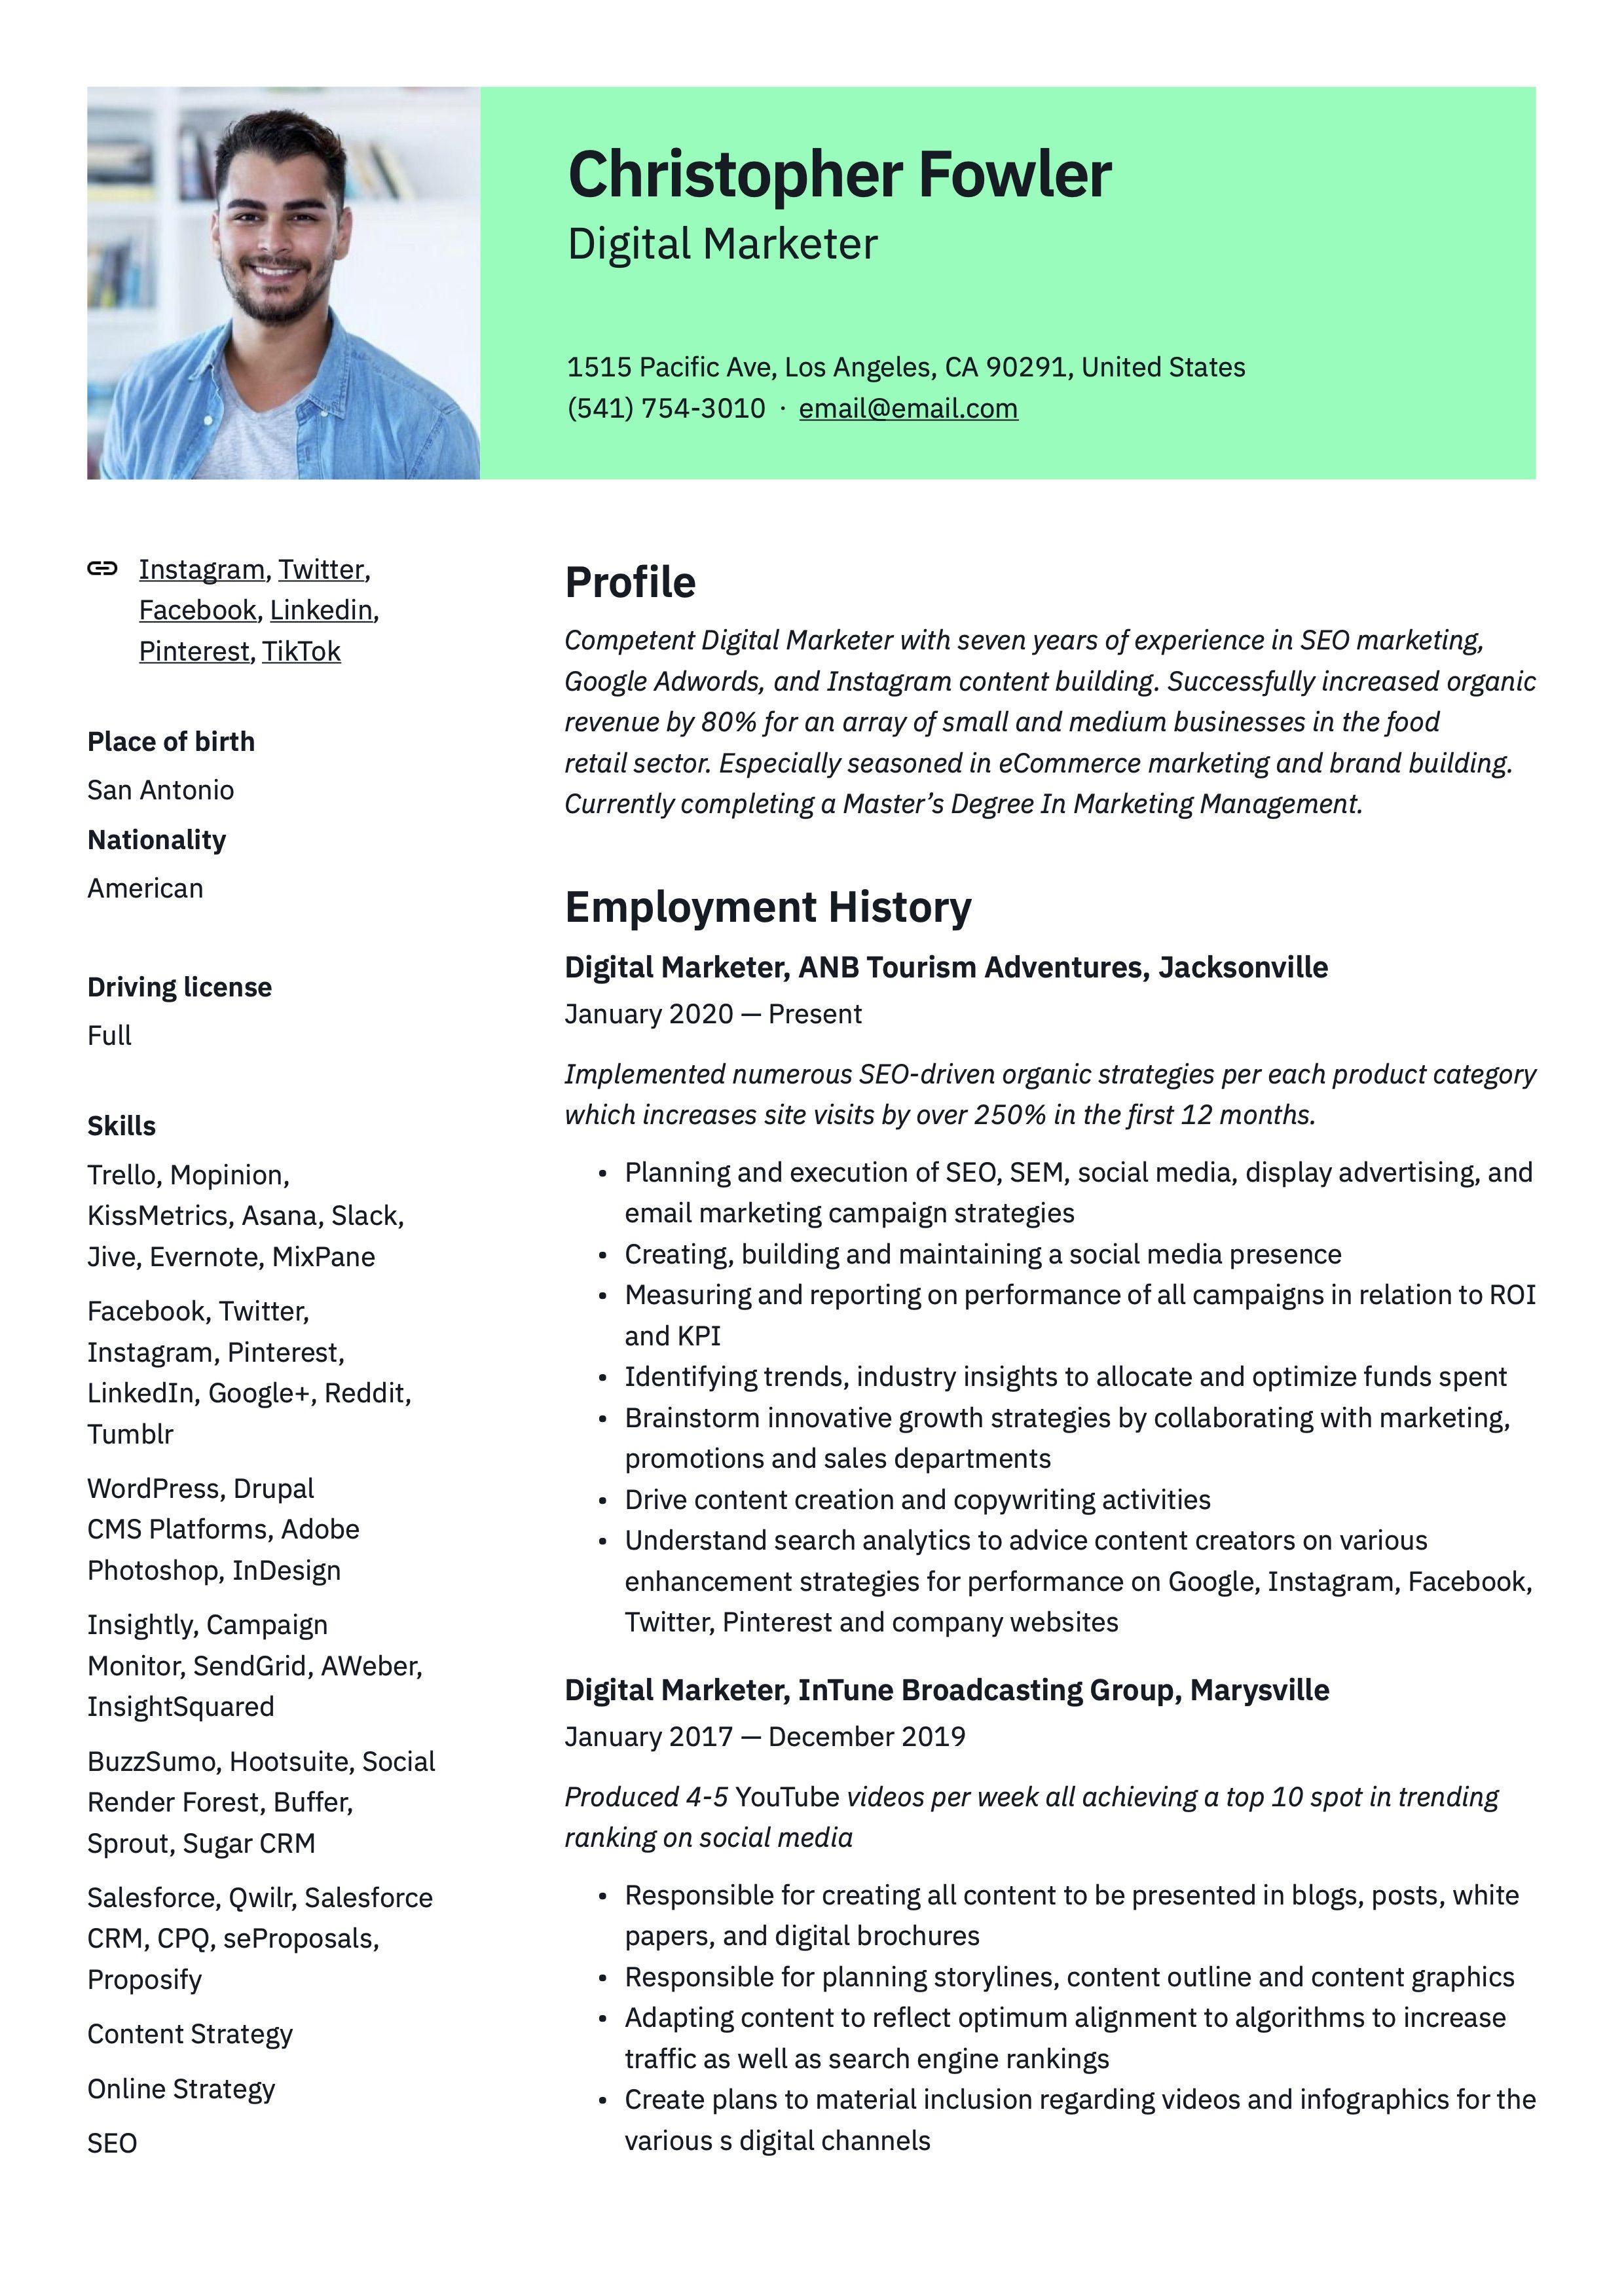 Digital marketer resume example in 2020 digital